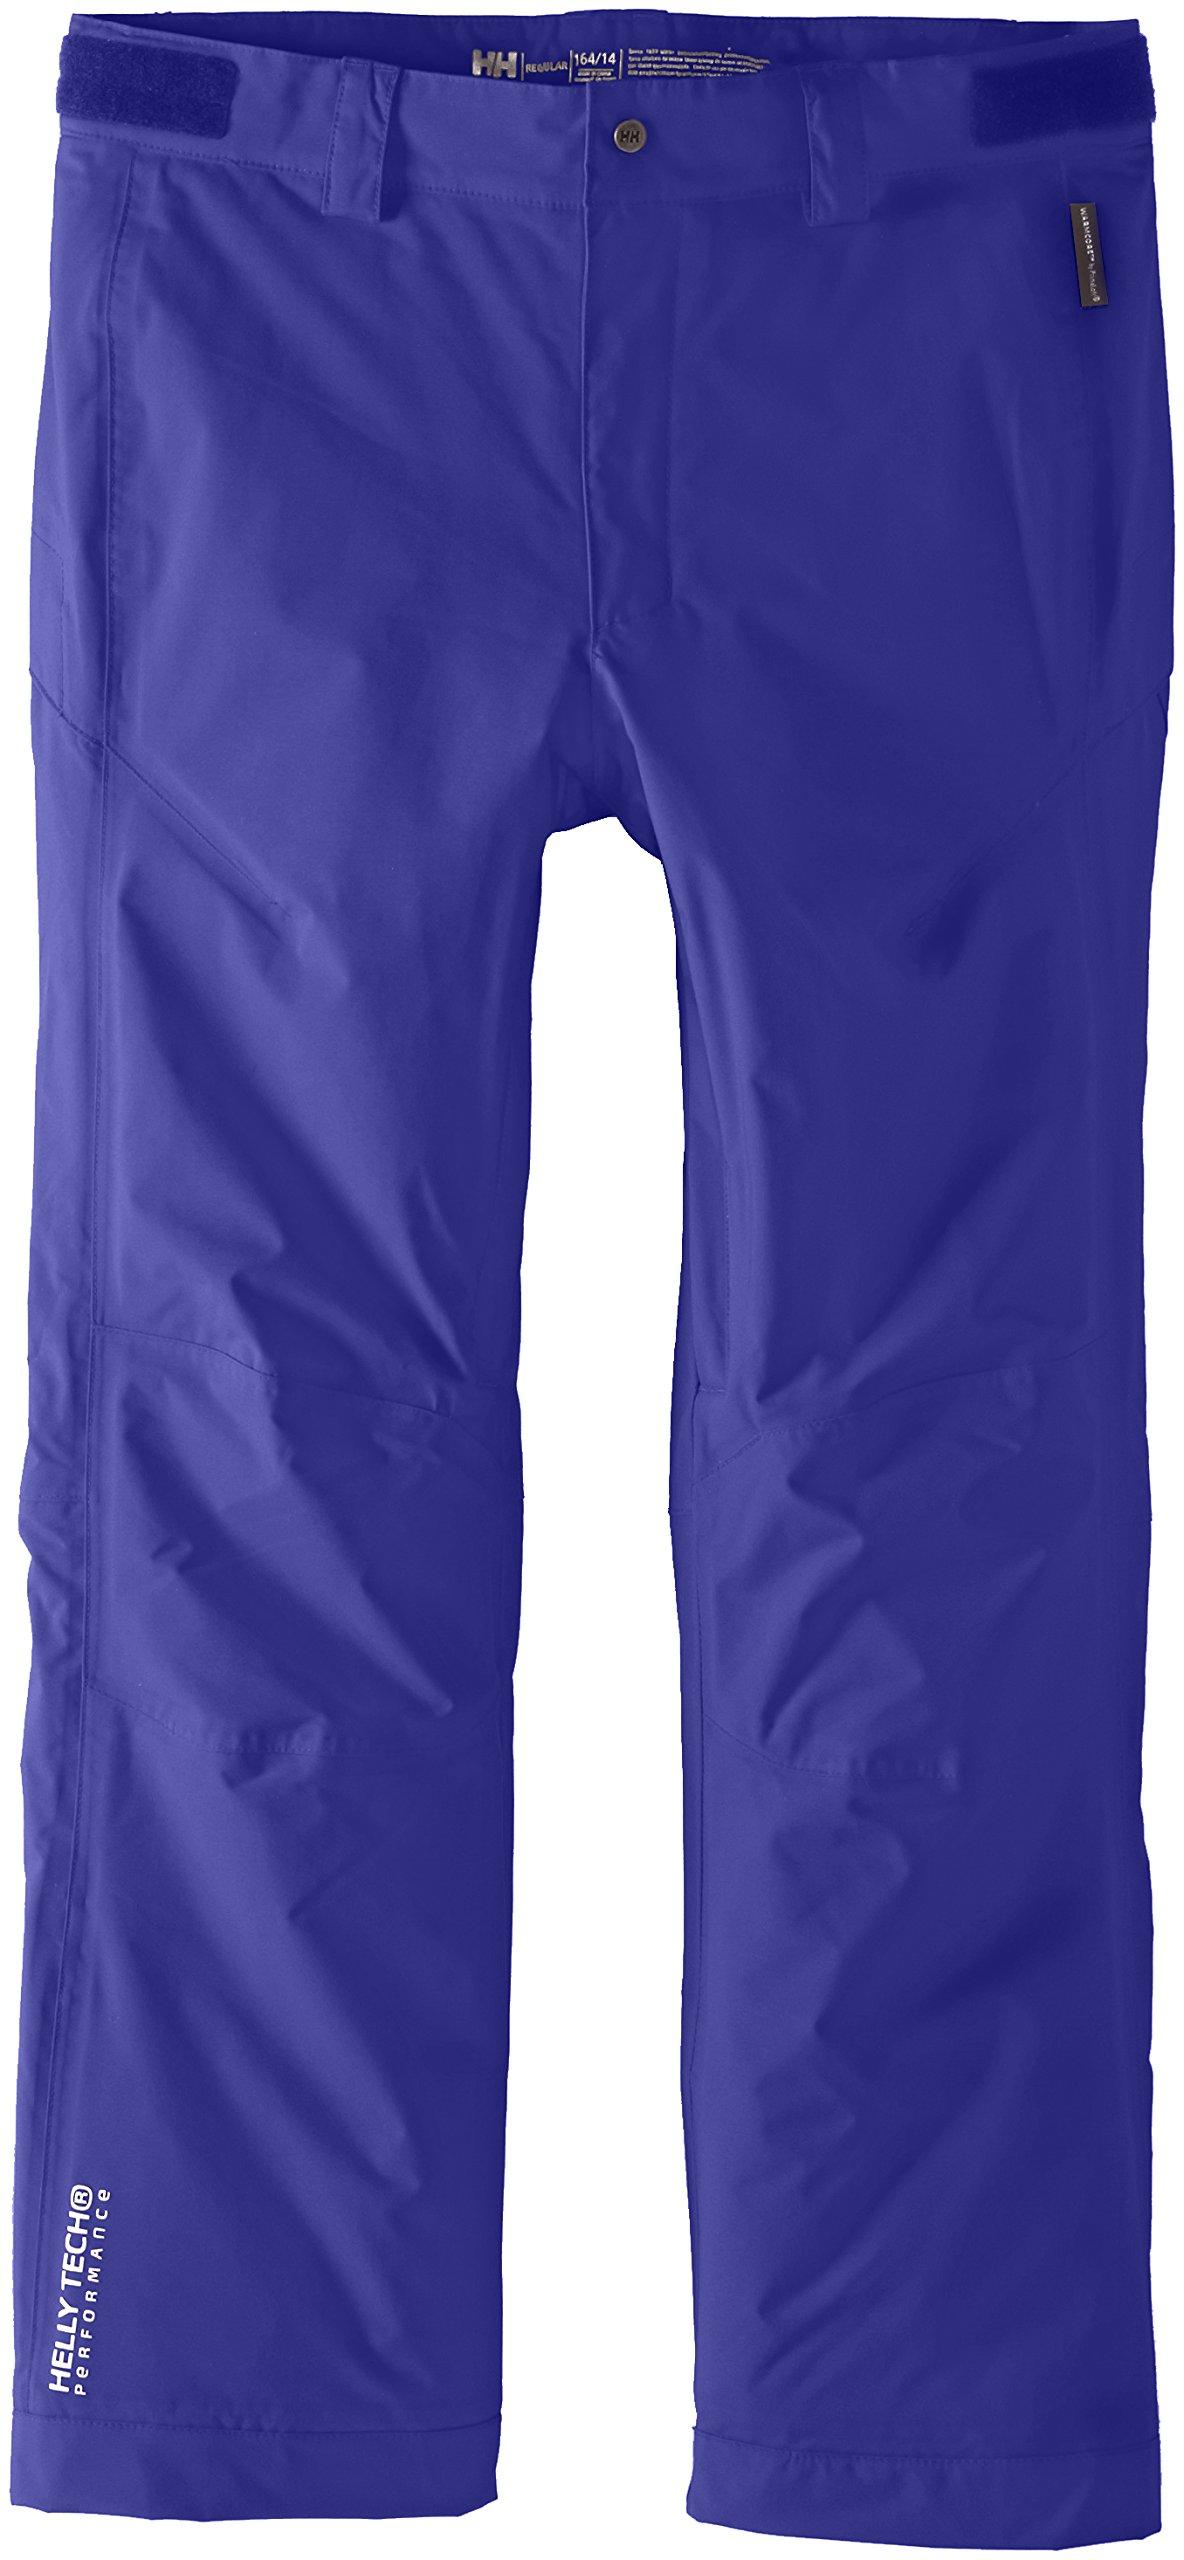 Helly Hansen Junior Legend Pants, Princess Purple, 16